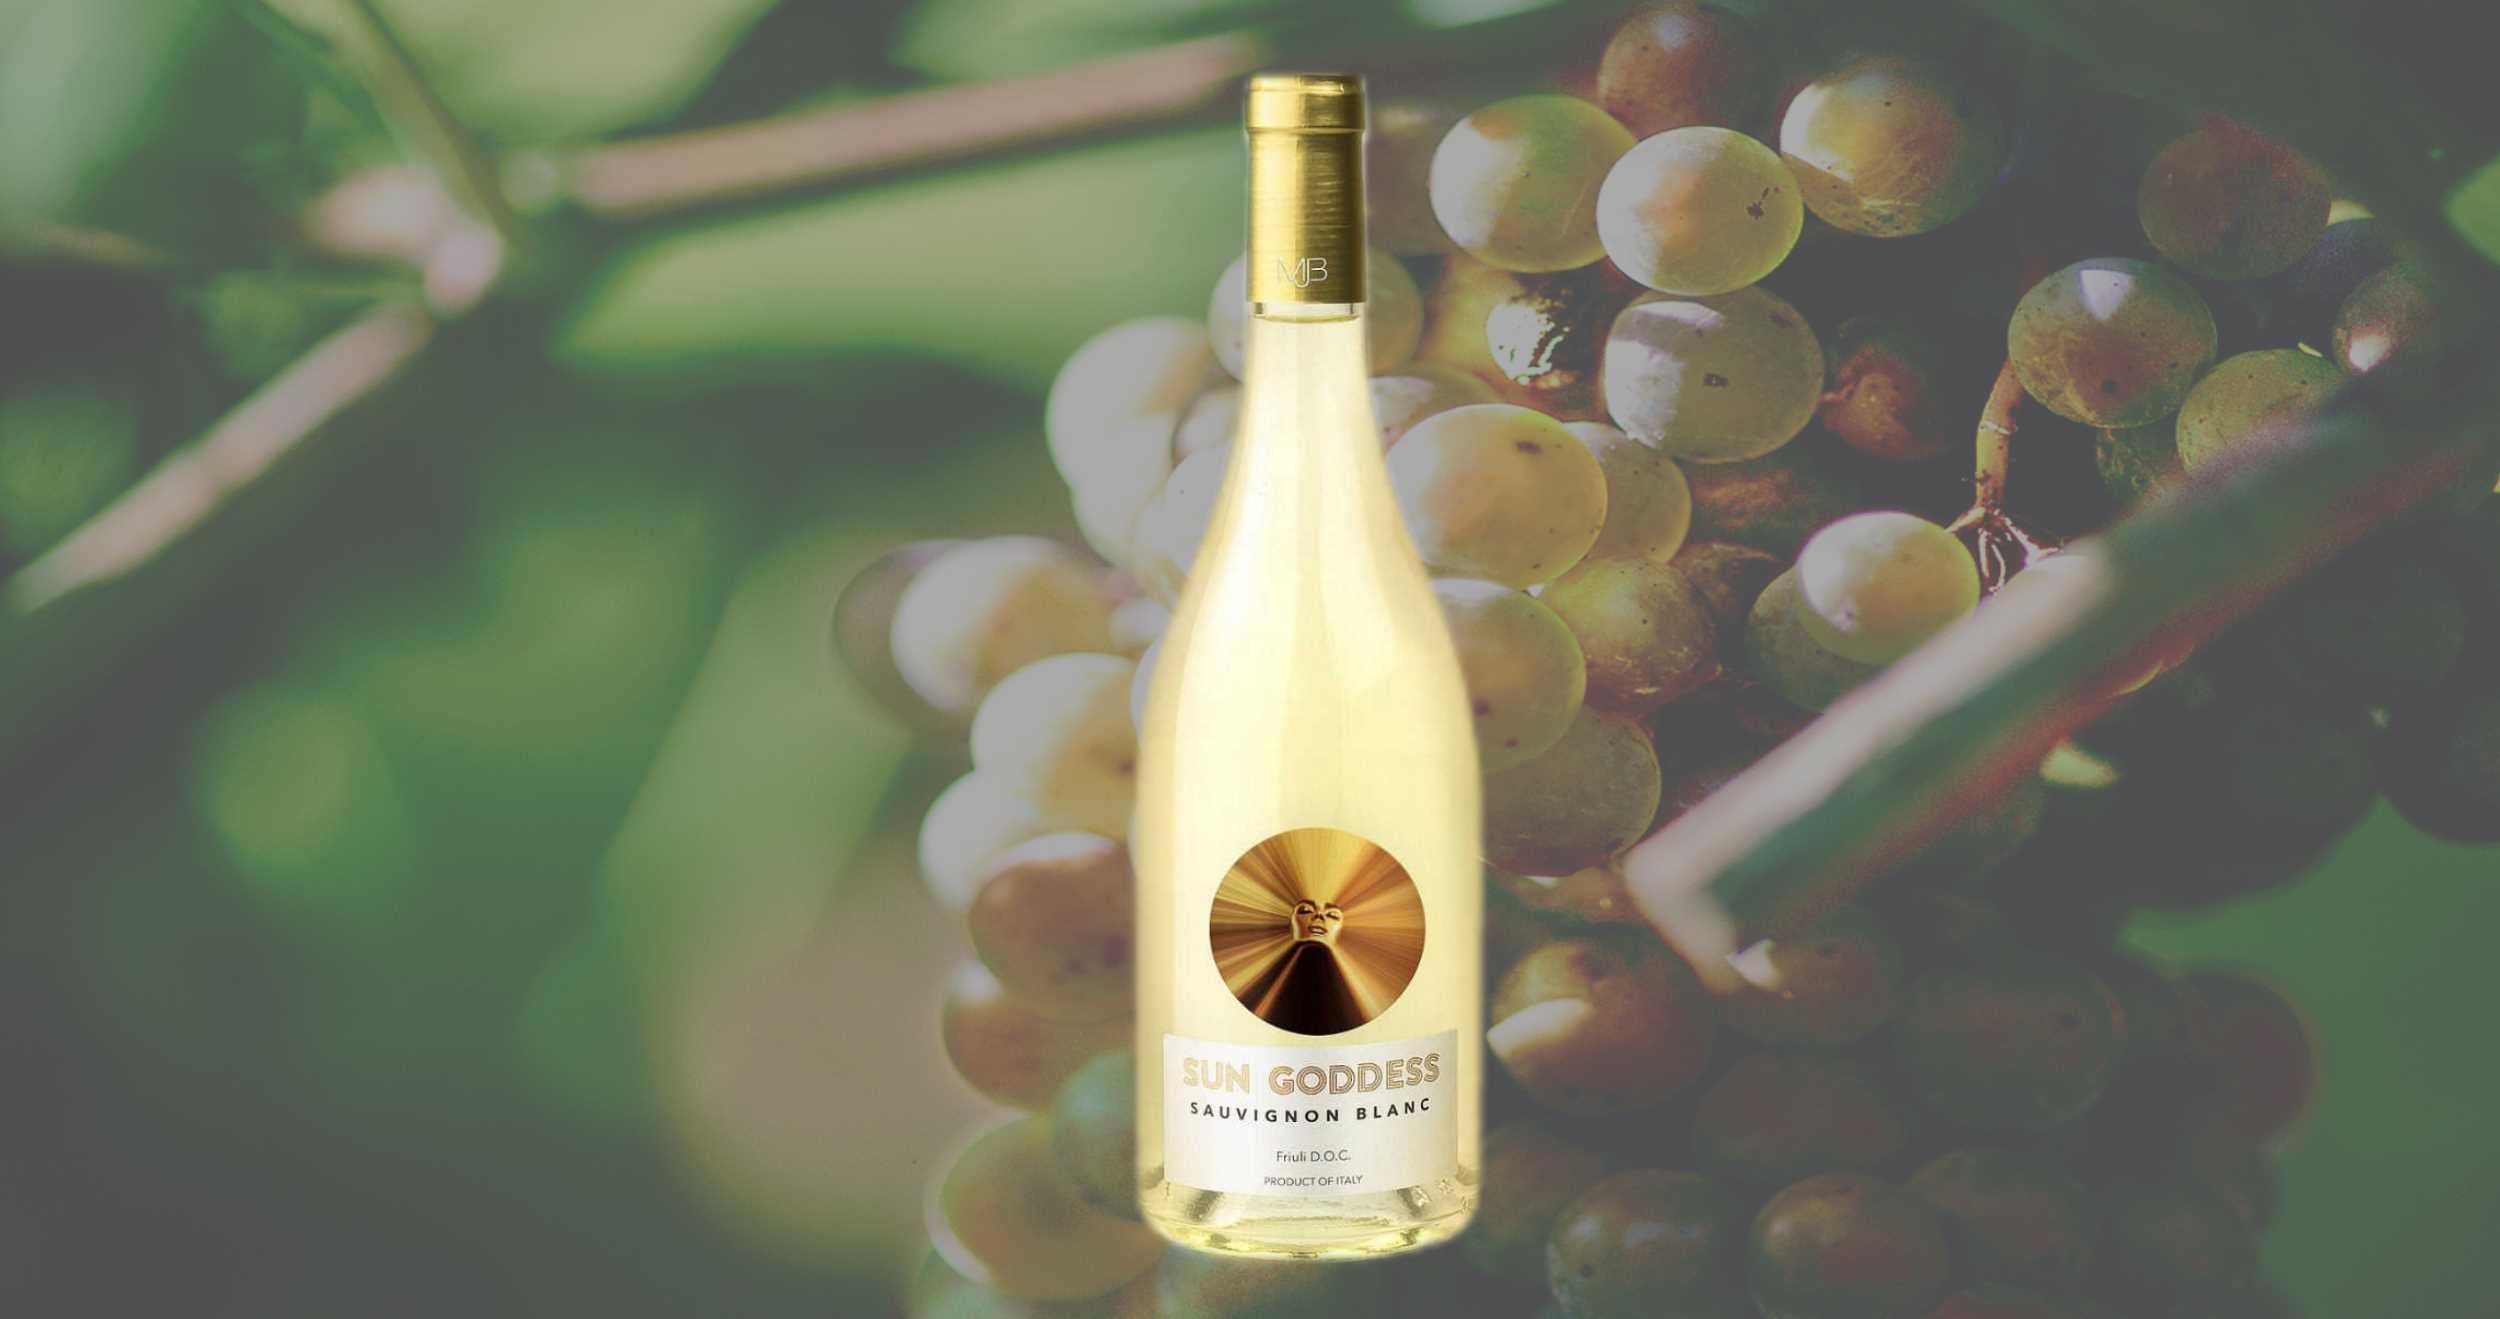 Sun Goddess-Sauvignon Blanc